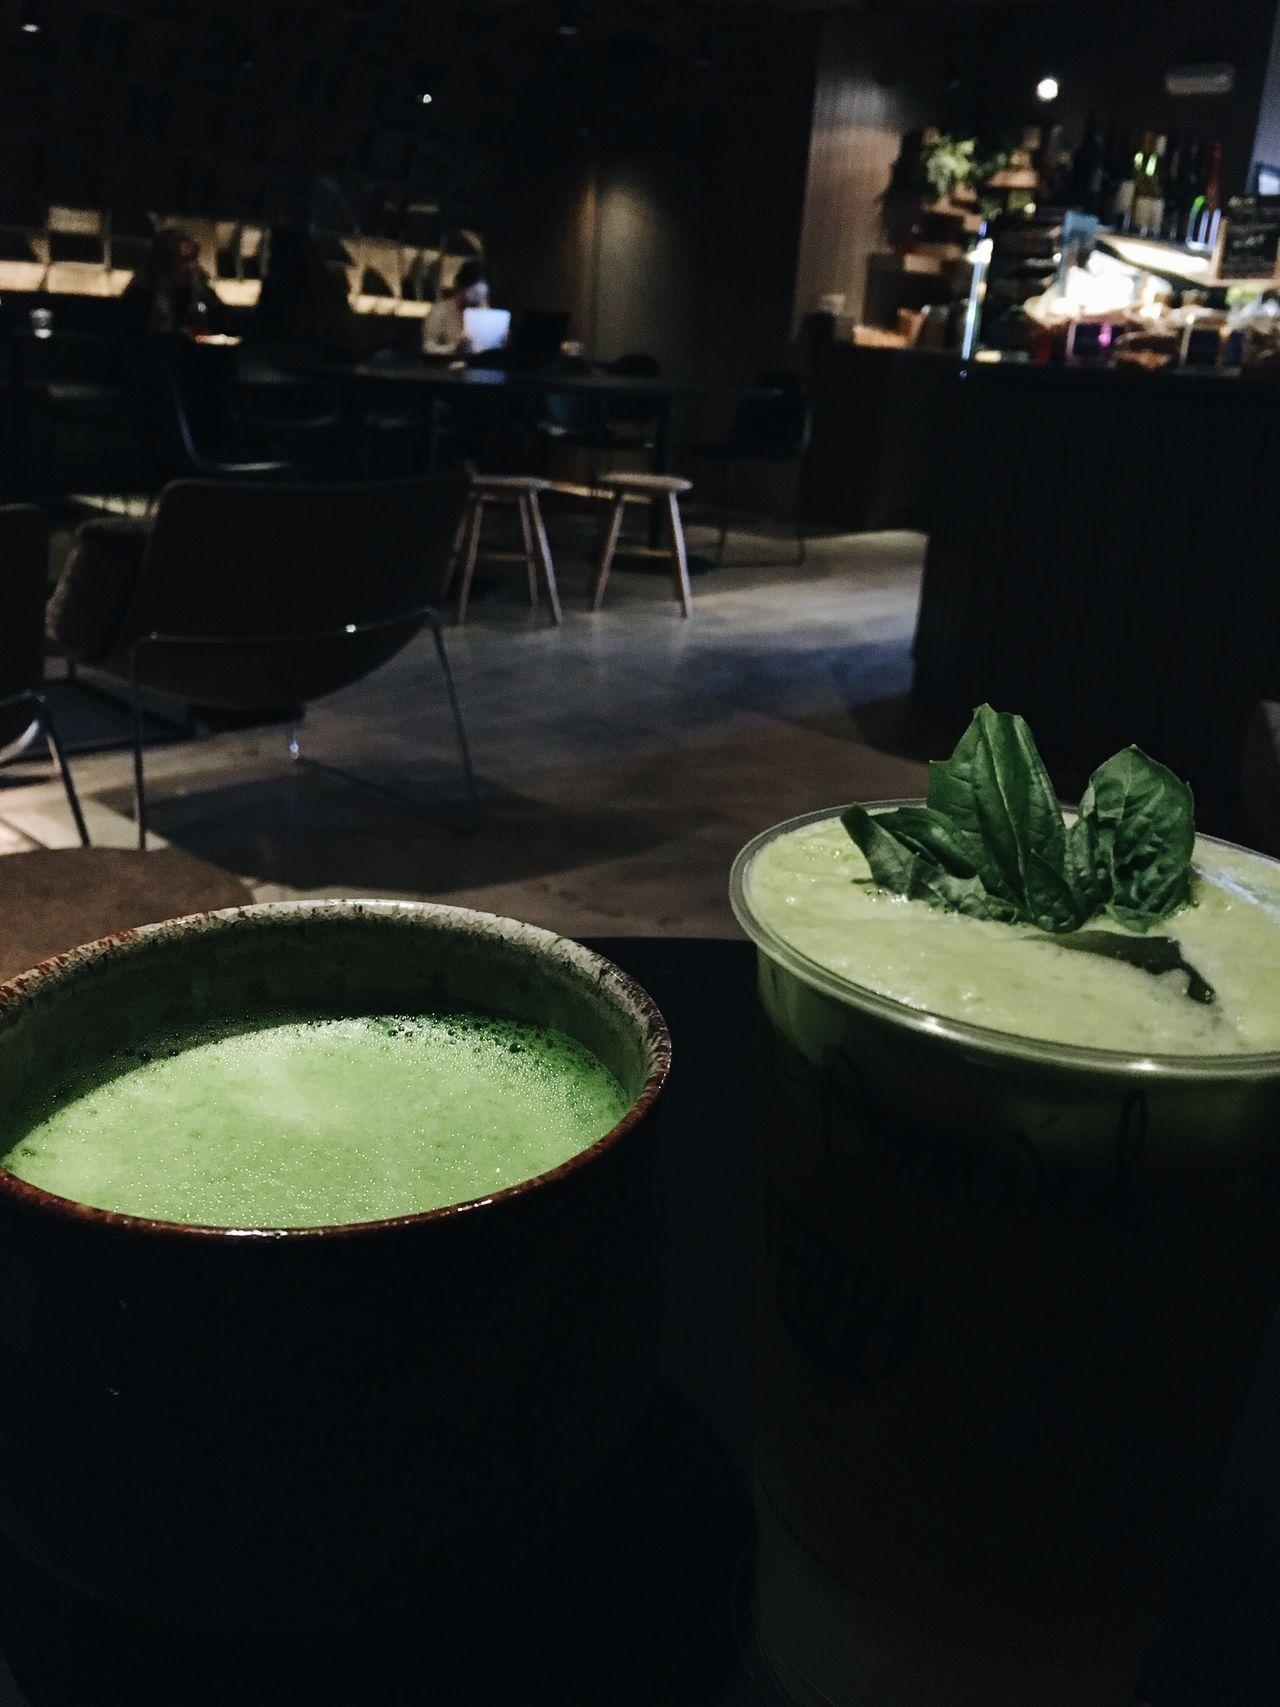 Matcha tea Tea Tea Time Matcha Green Color Green Drink Hot Iced Latte Dim Light